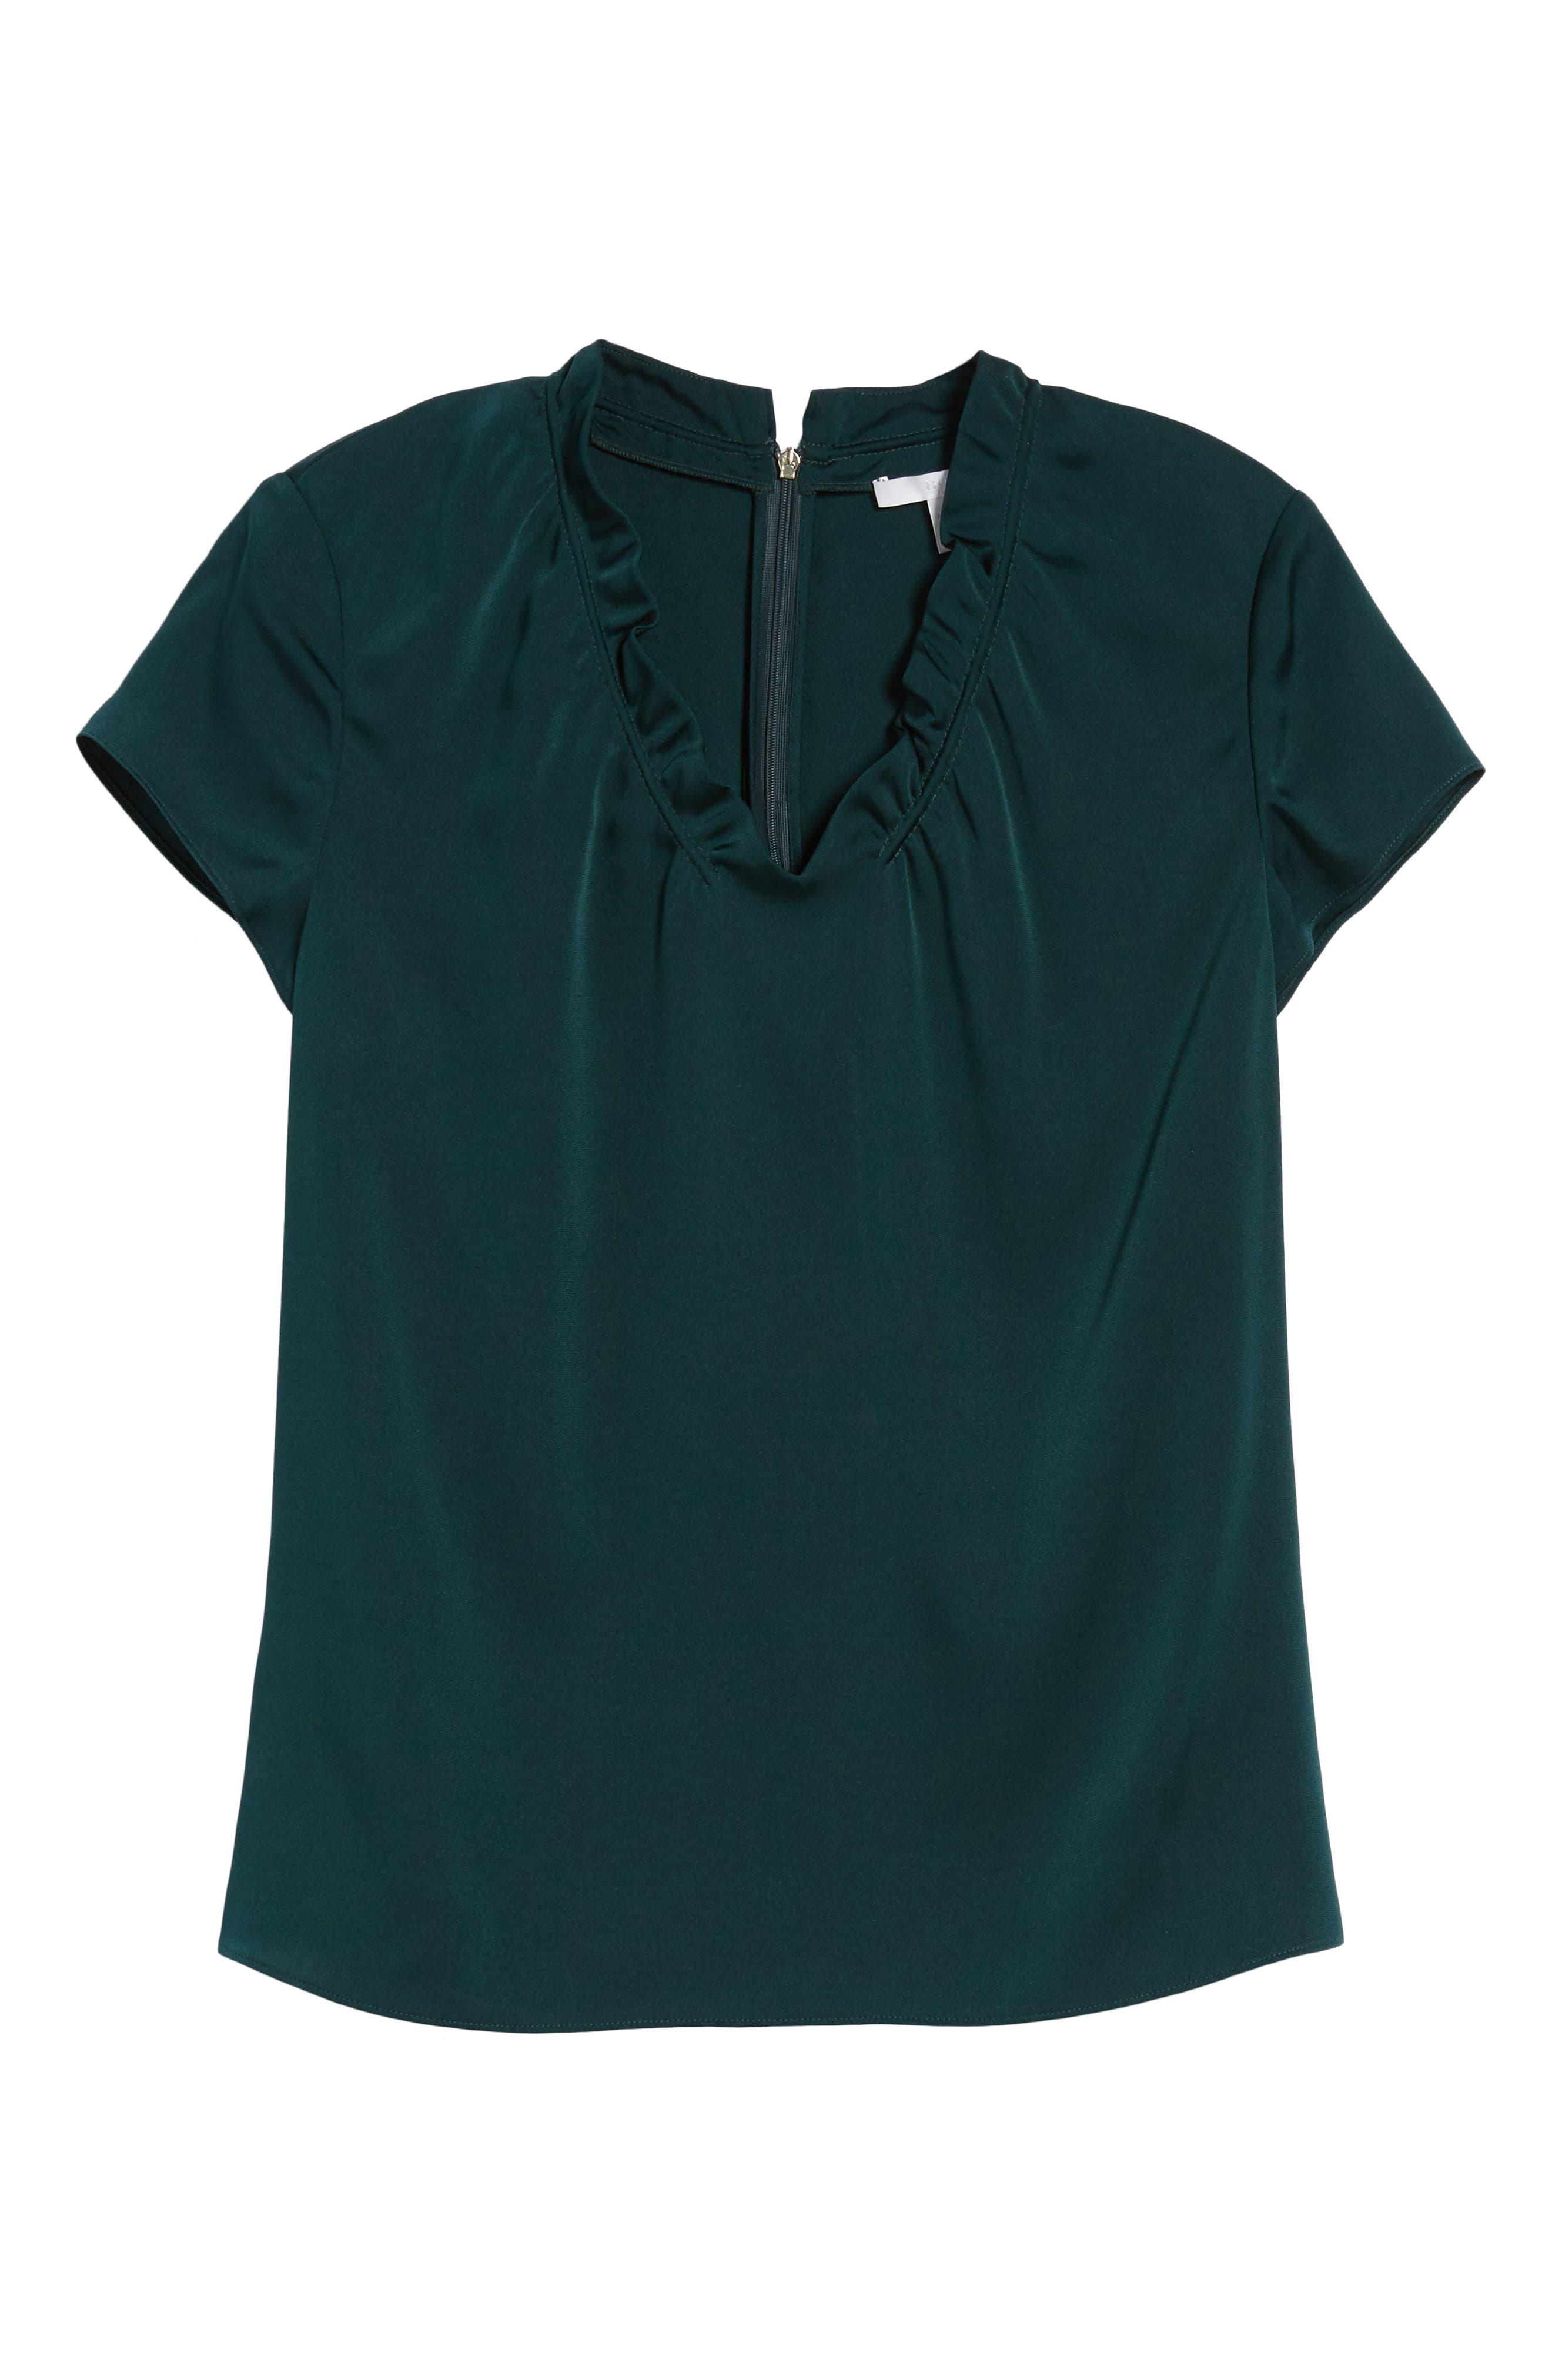 Isamara Stretch Silk Top,                             Alternate thumbnail 6, color,                             Peacock Green